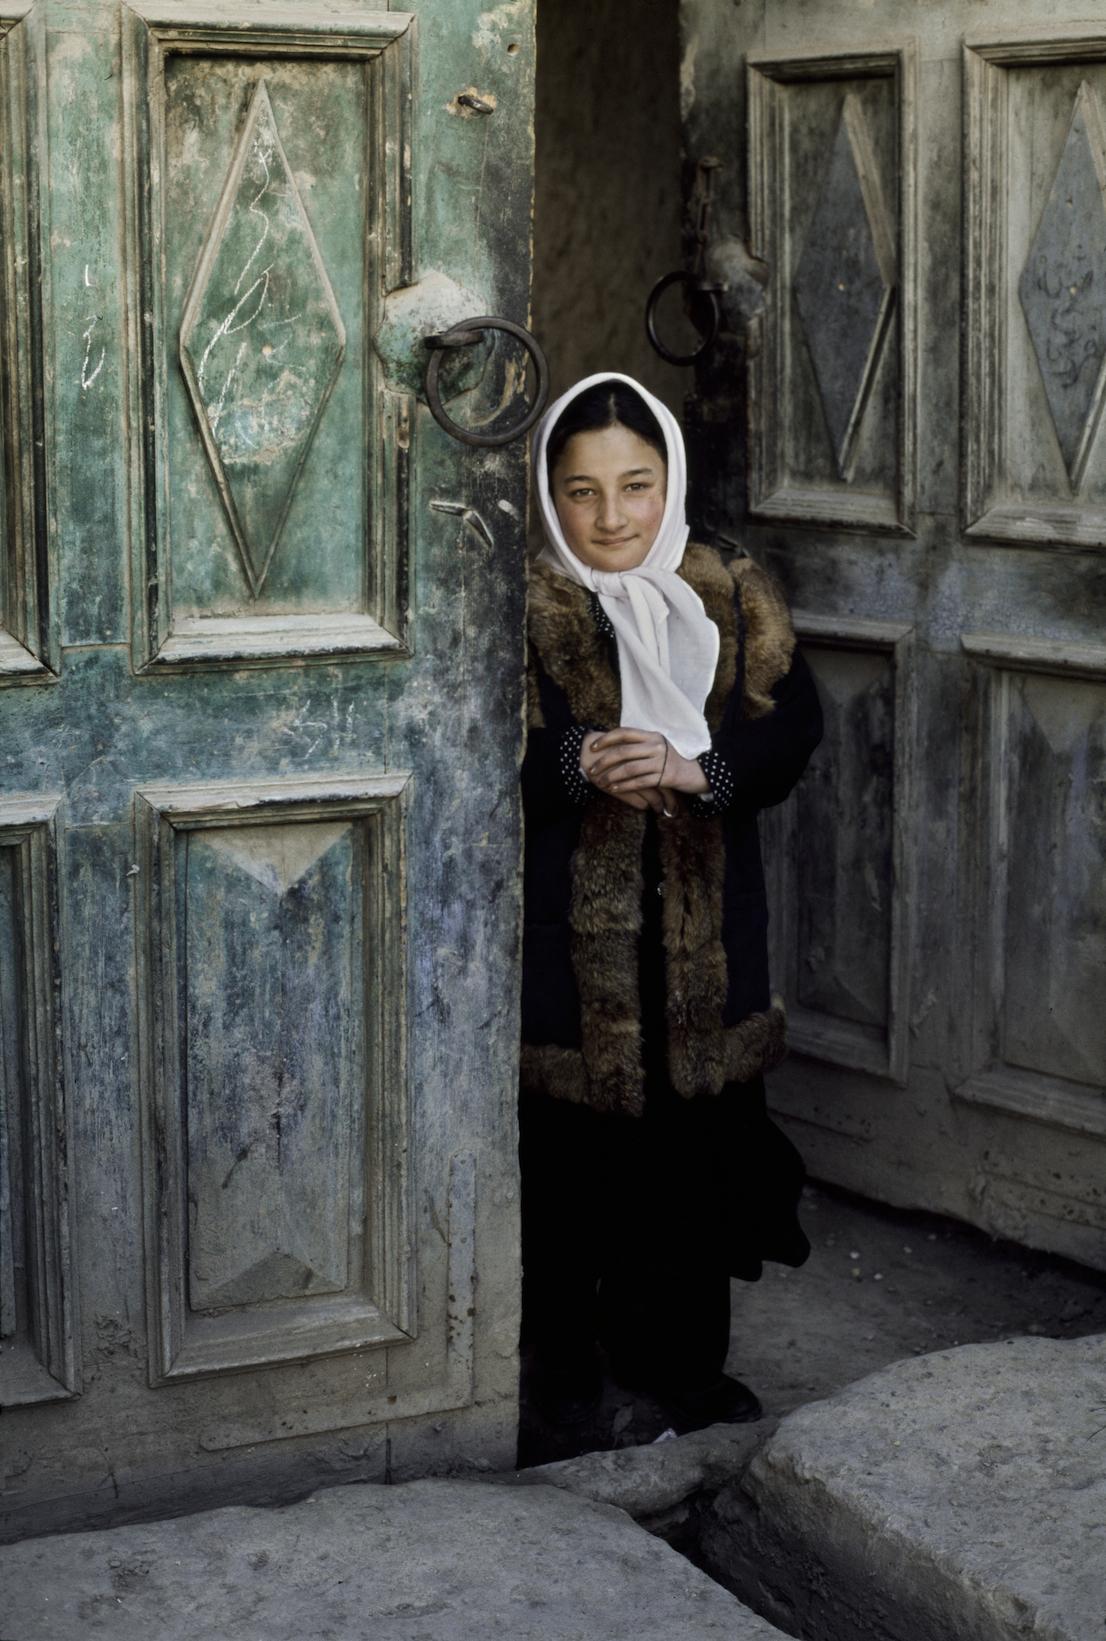 Ragazza sull'uscio, Afghanistan, 2003